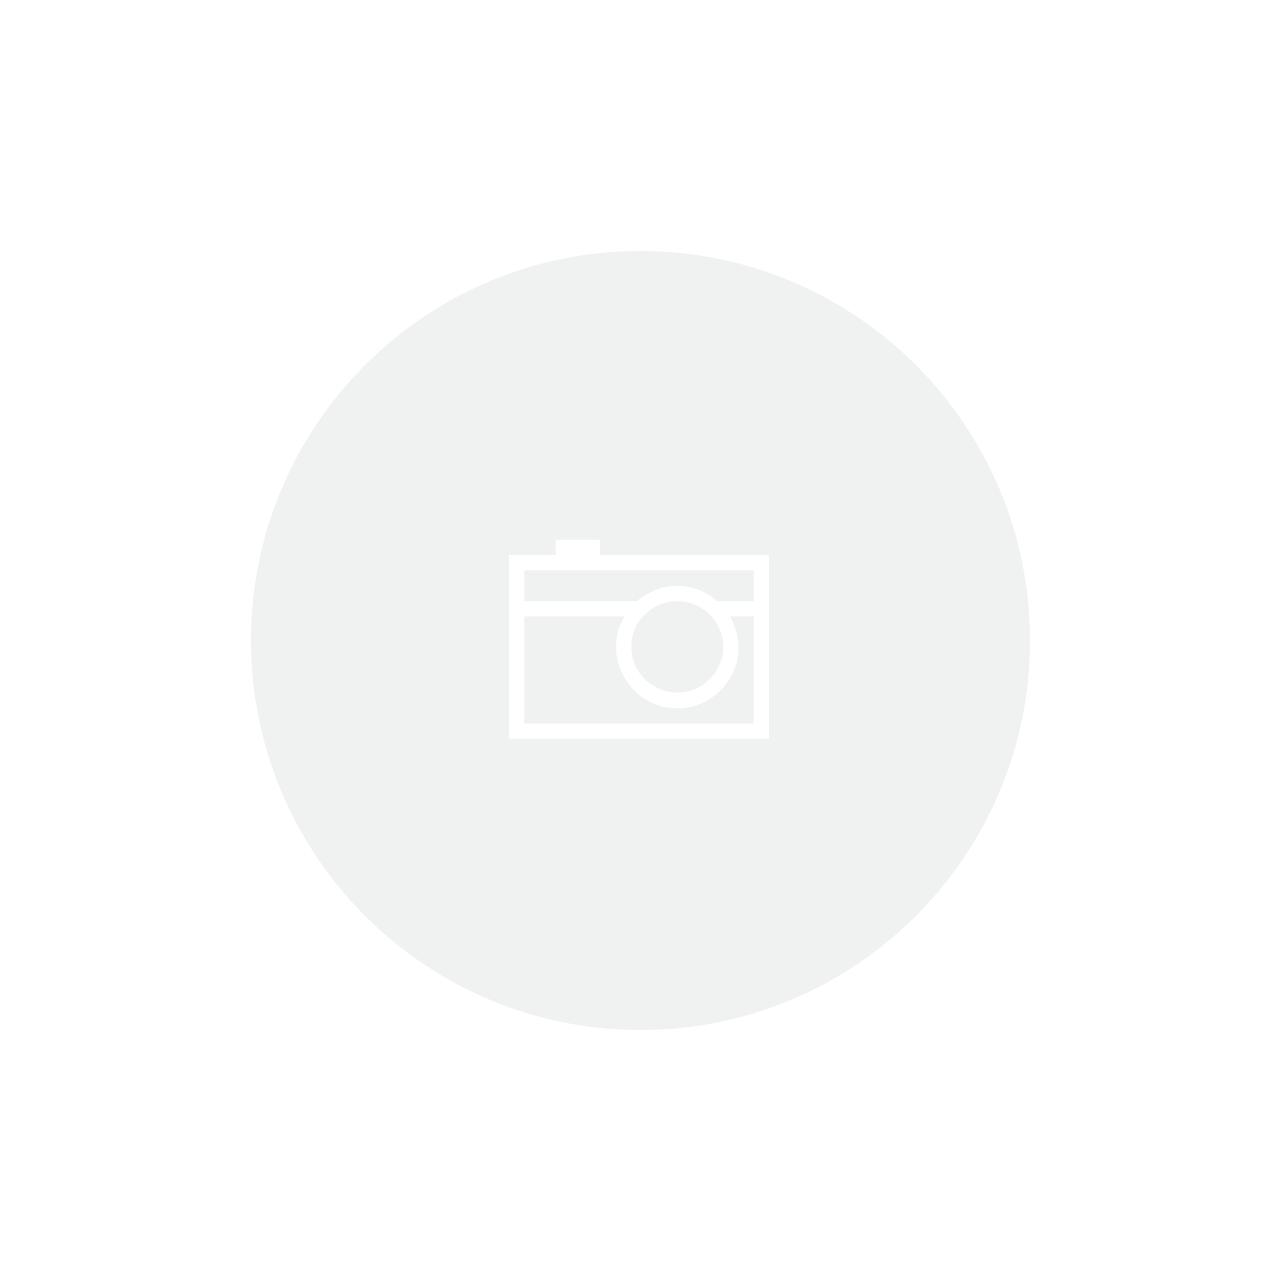 Assadeira em Inox 43X28Cm Cosmos Tramontina